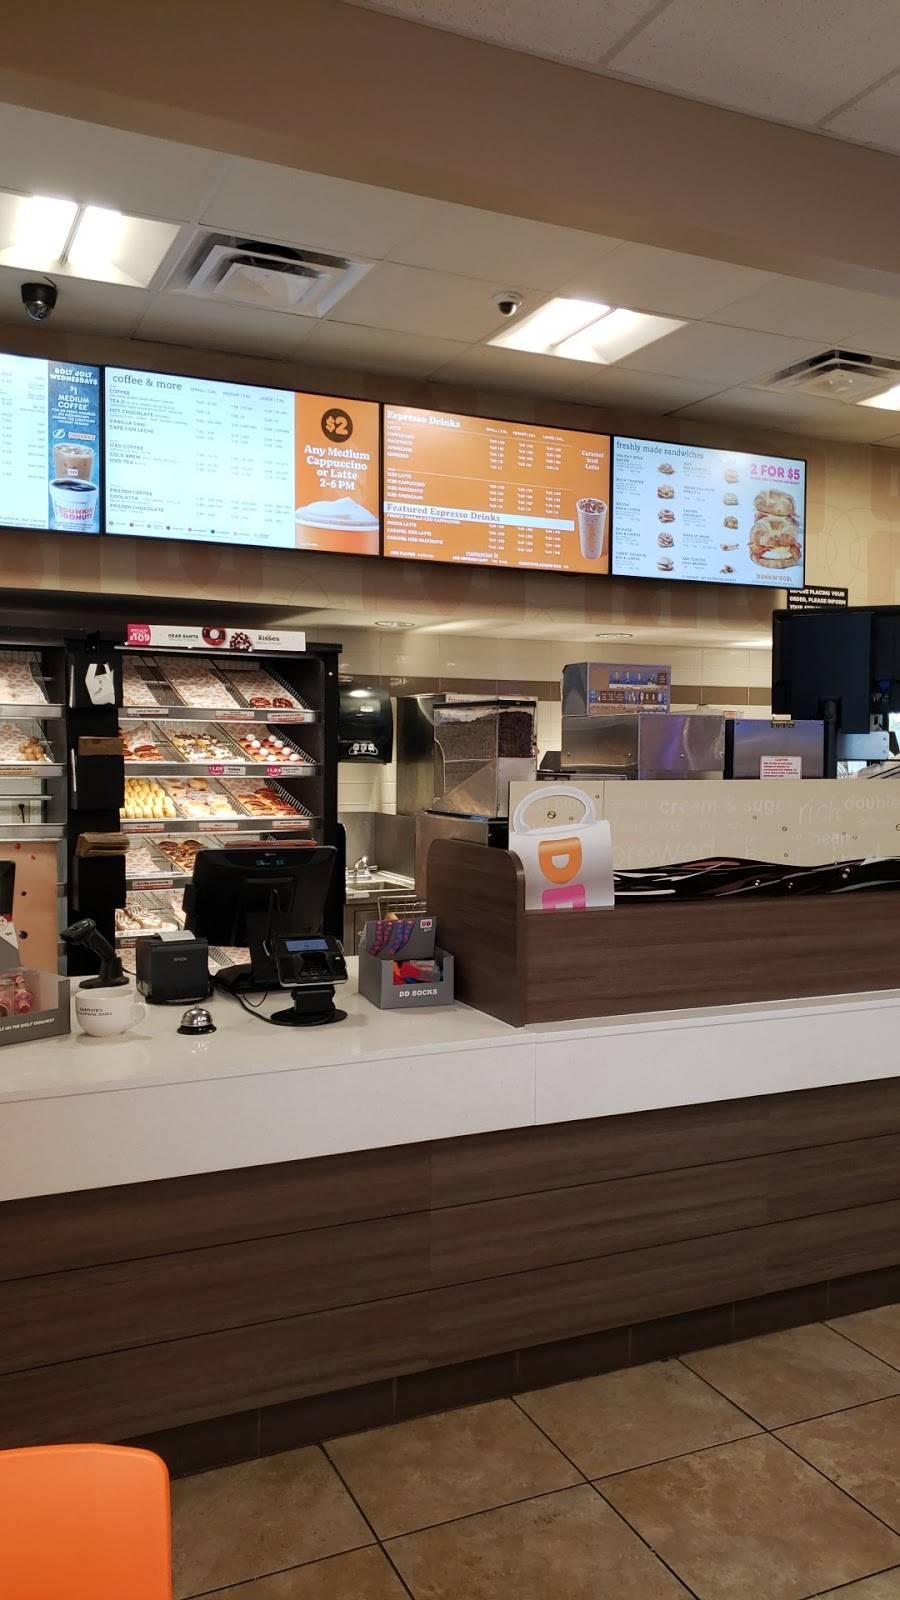 Dunkin - bakery  | Photo 6 of 10 | Address: 9020 Progress Blvd, Riverview, FL 33578, USA | Phone: (813) 231-4884